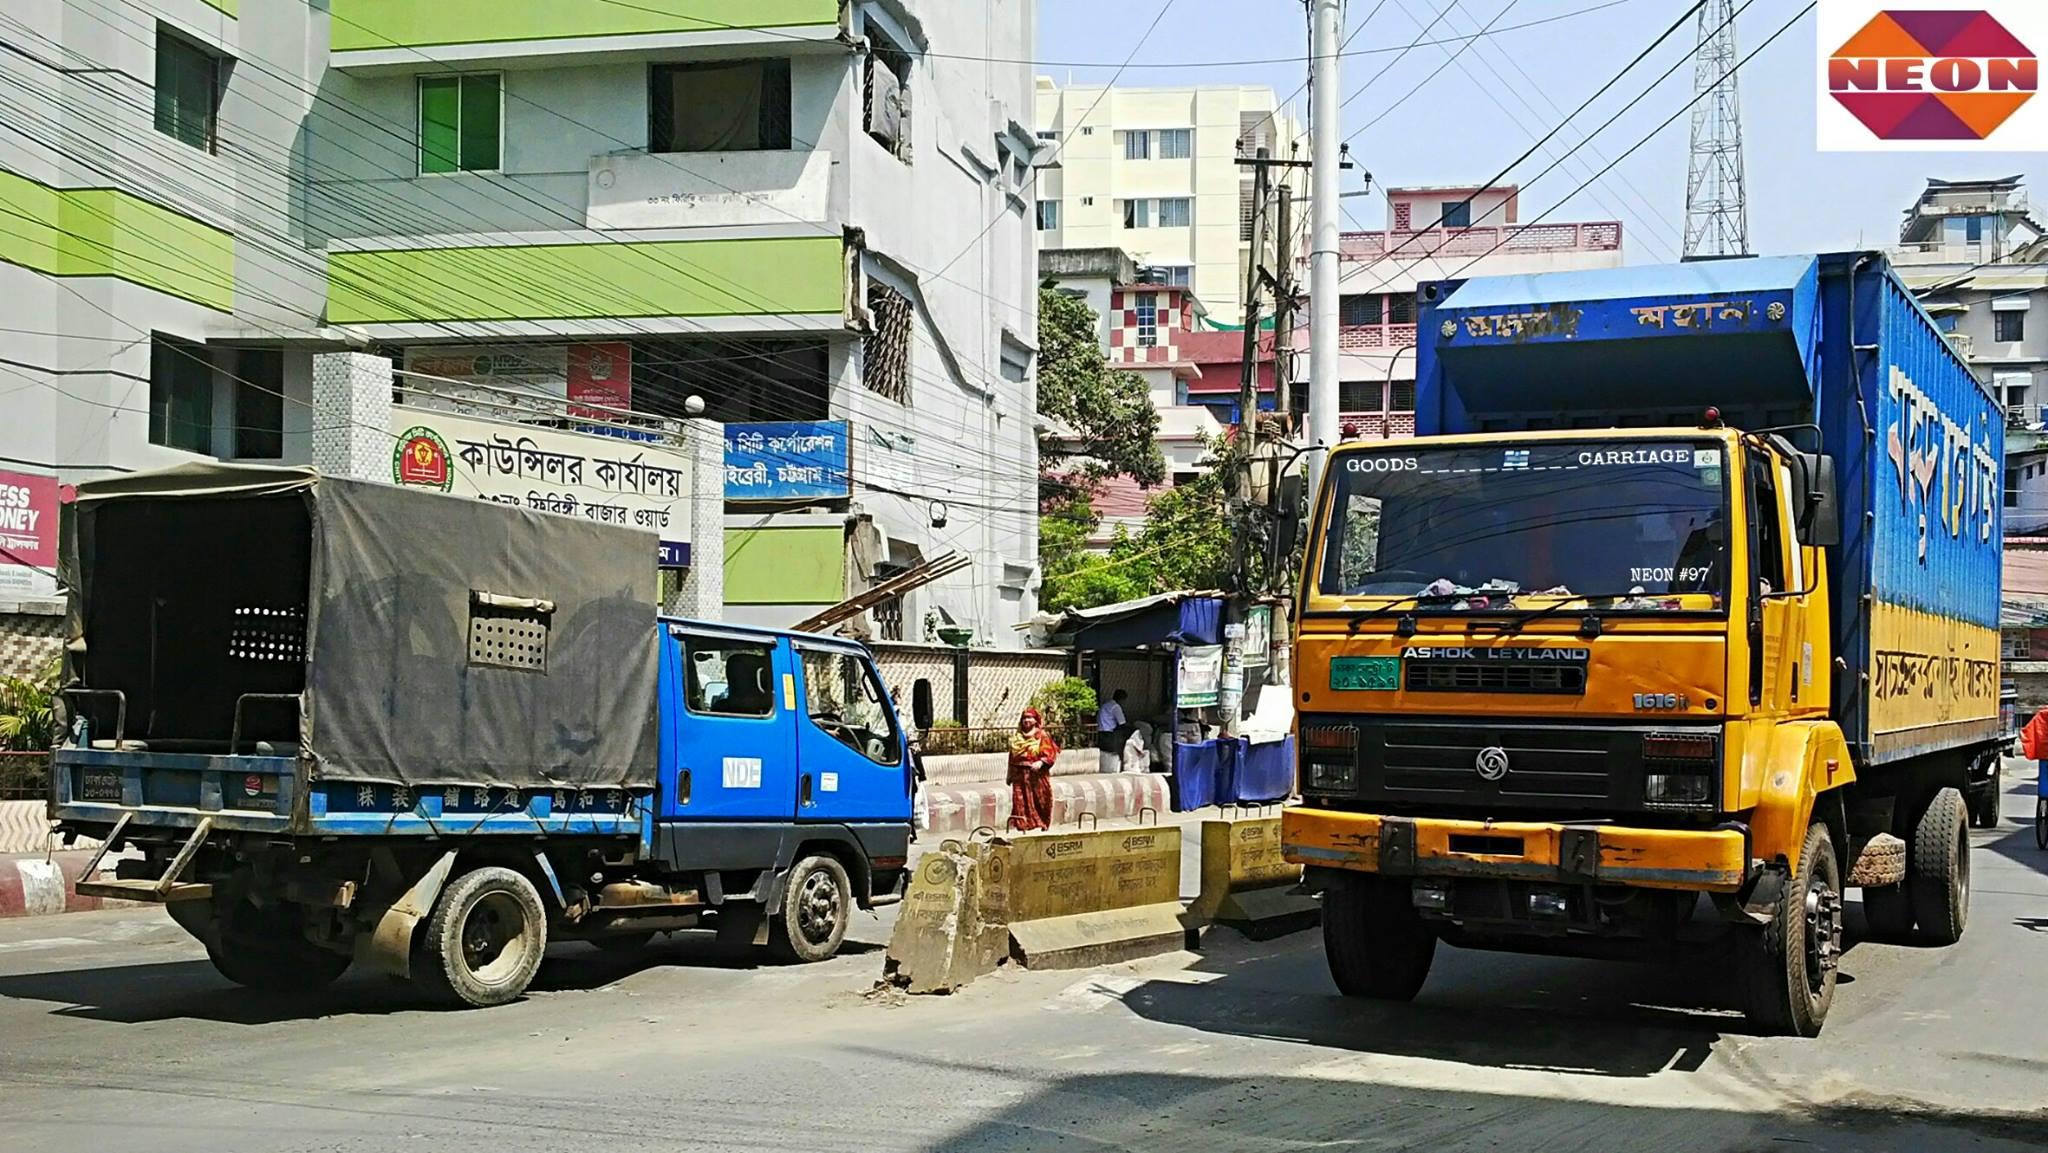 Ashok-Leyland-1616il-KABI-NAZRUL-ISLAM-ROAD-FIRINGIBAZAR--CHITTAGONG-BANGLADESH-